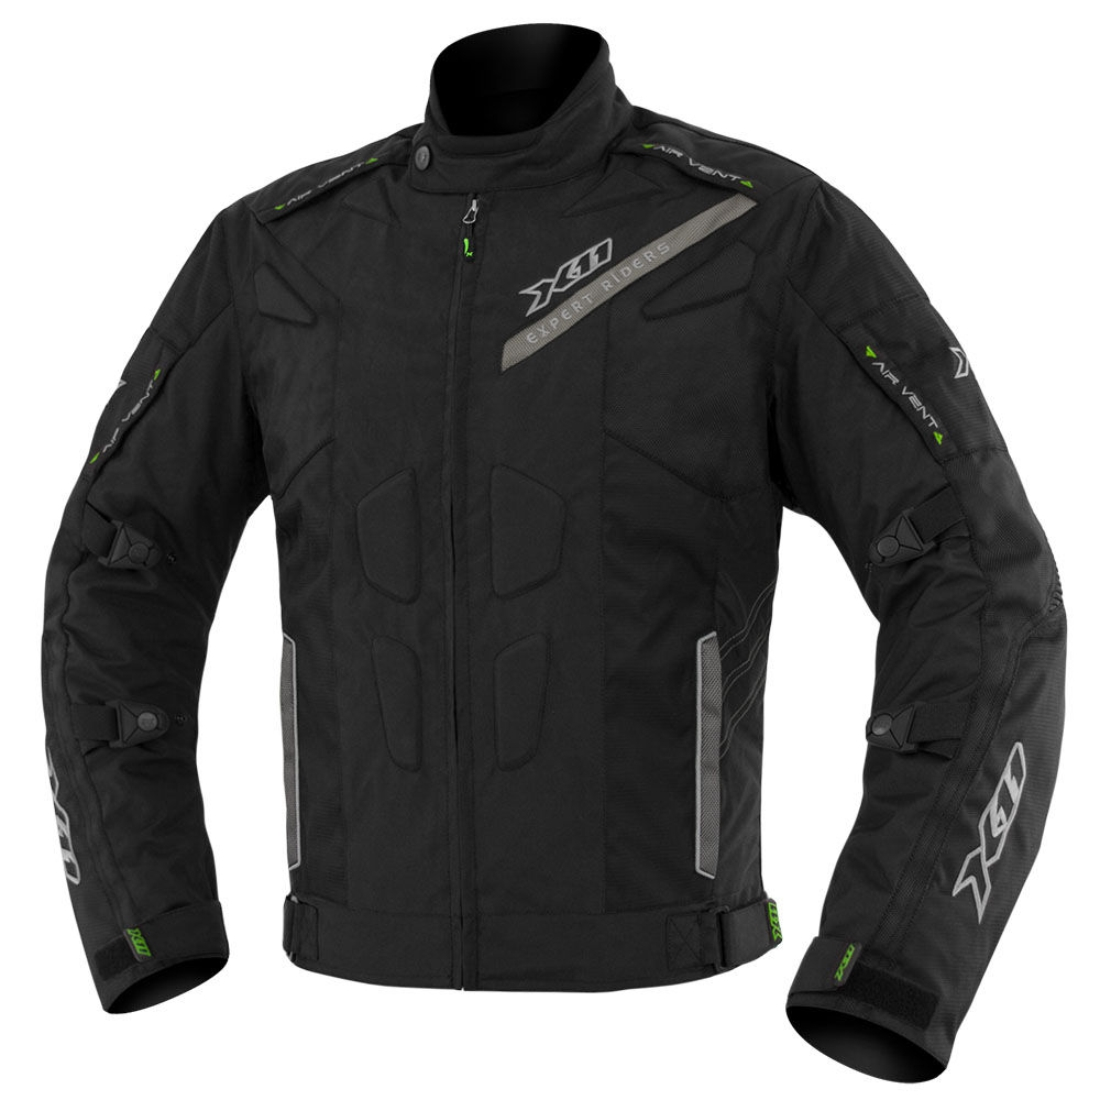 Jaqueta X11 Evo 3 Motociclista Moto Motoqueiro Masculino